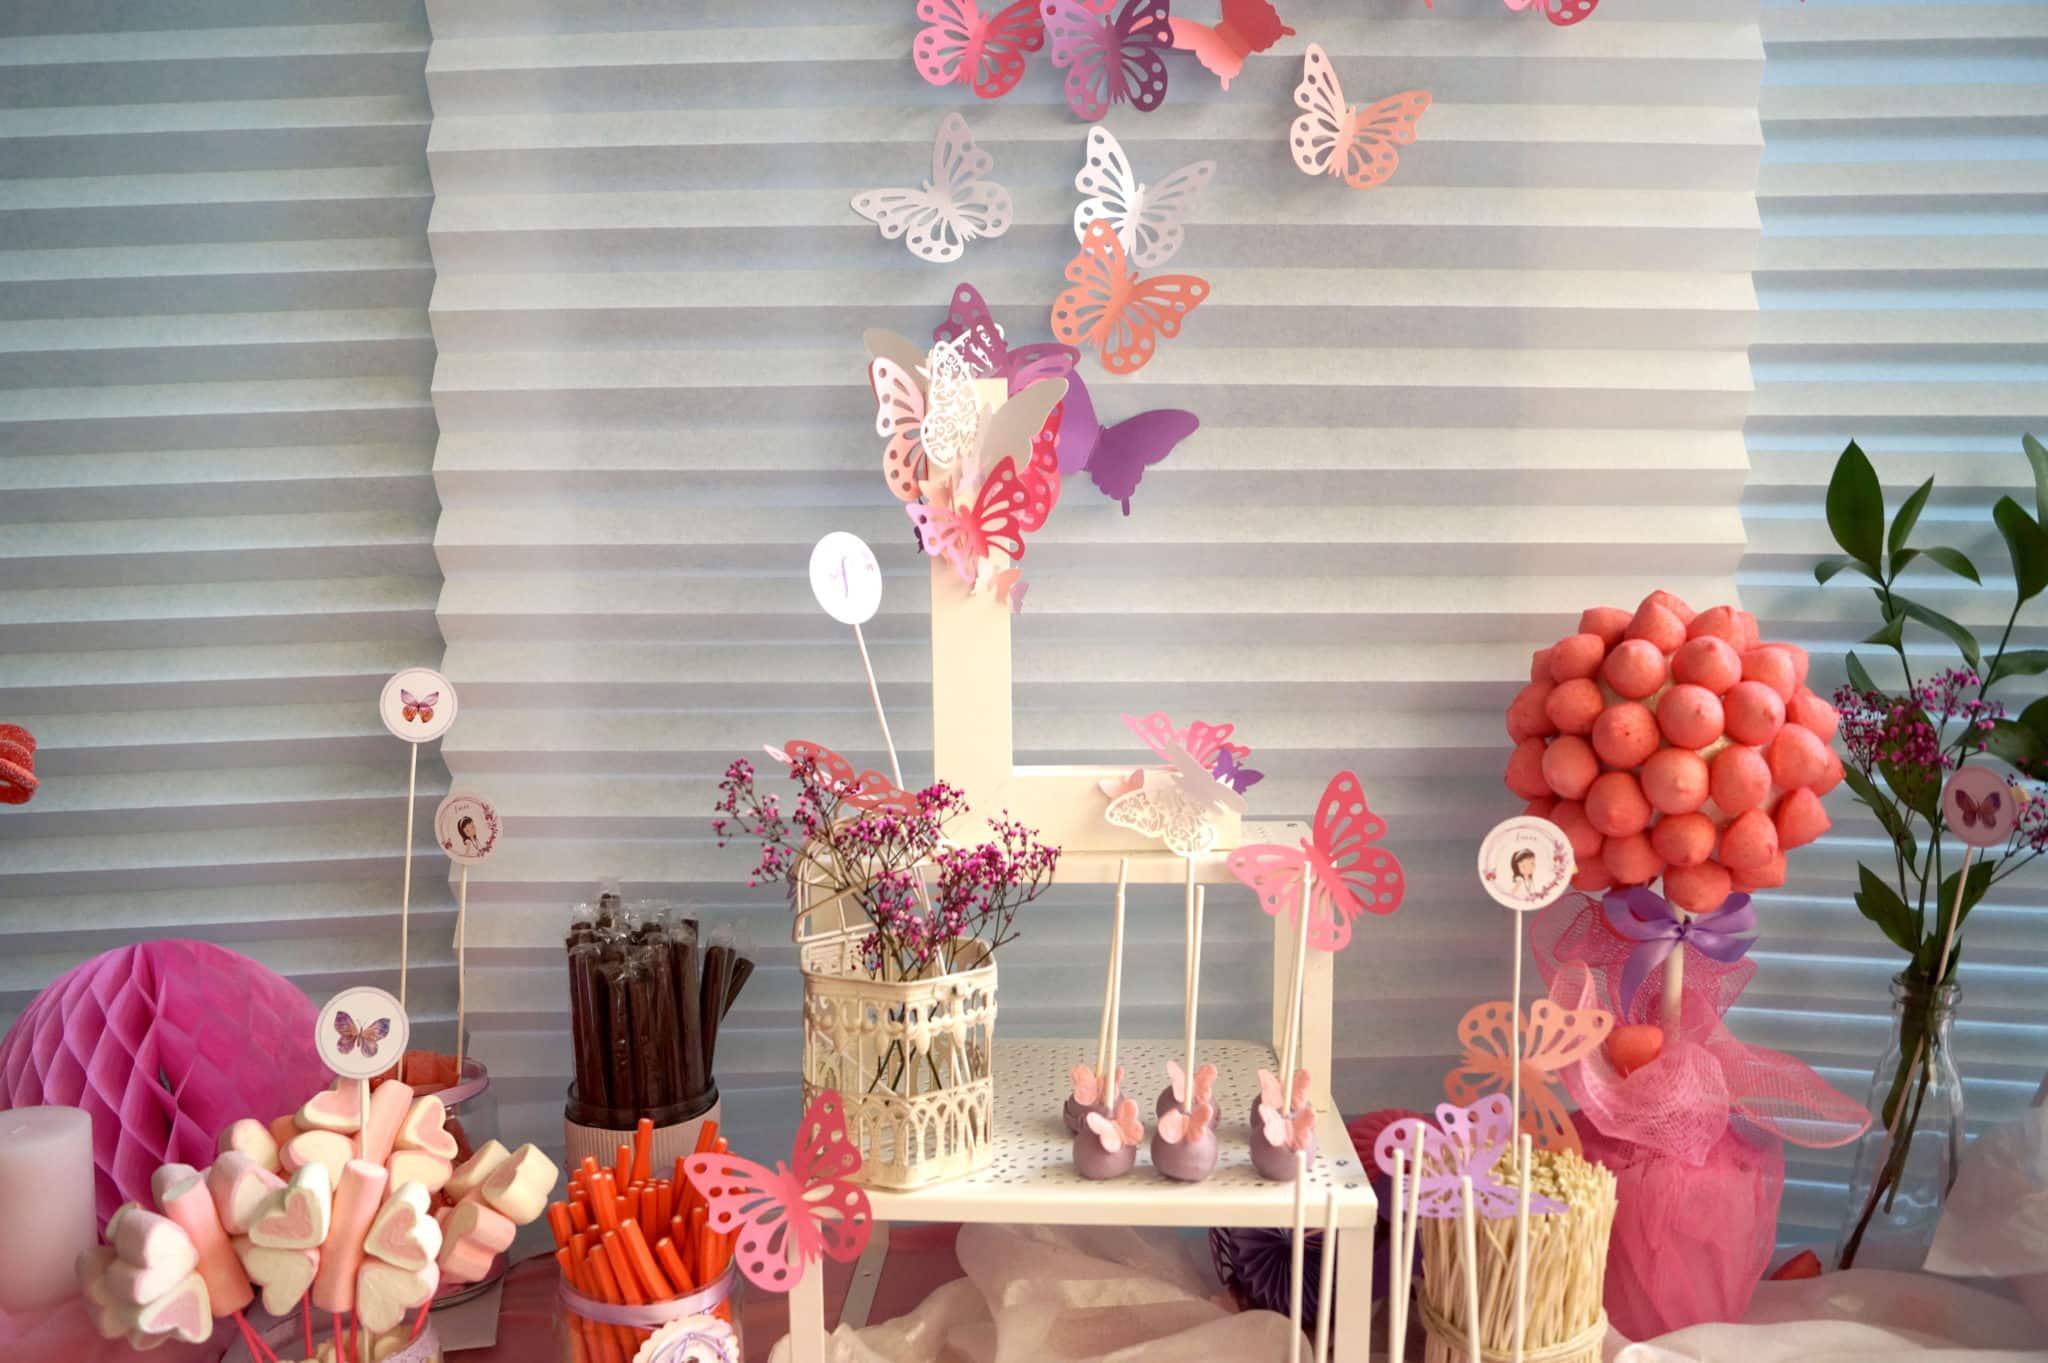 Detalle mesa dulce comunión en tonos rosas y morados con mariposas